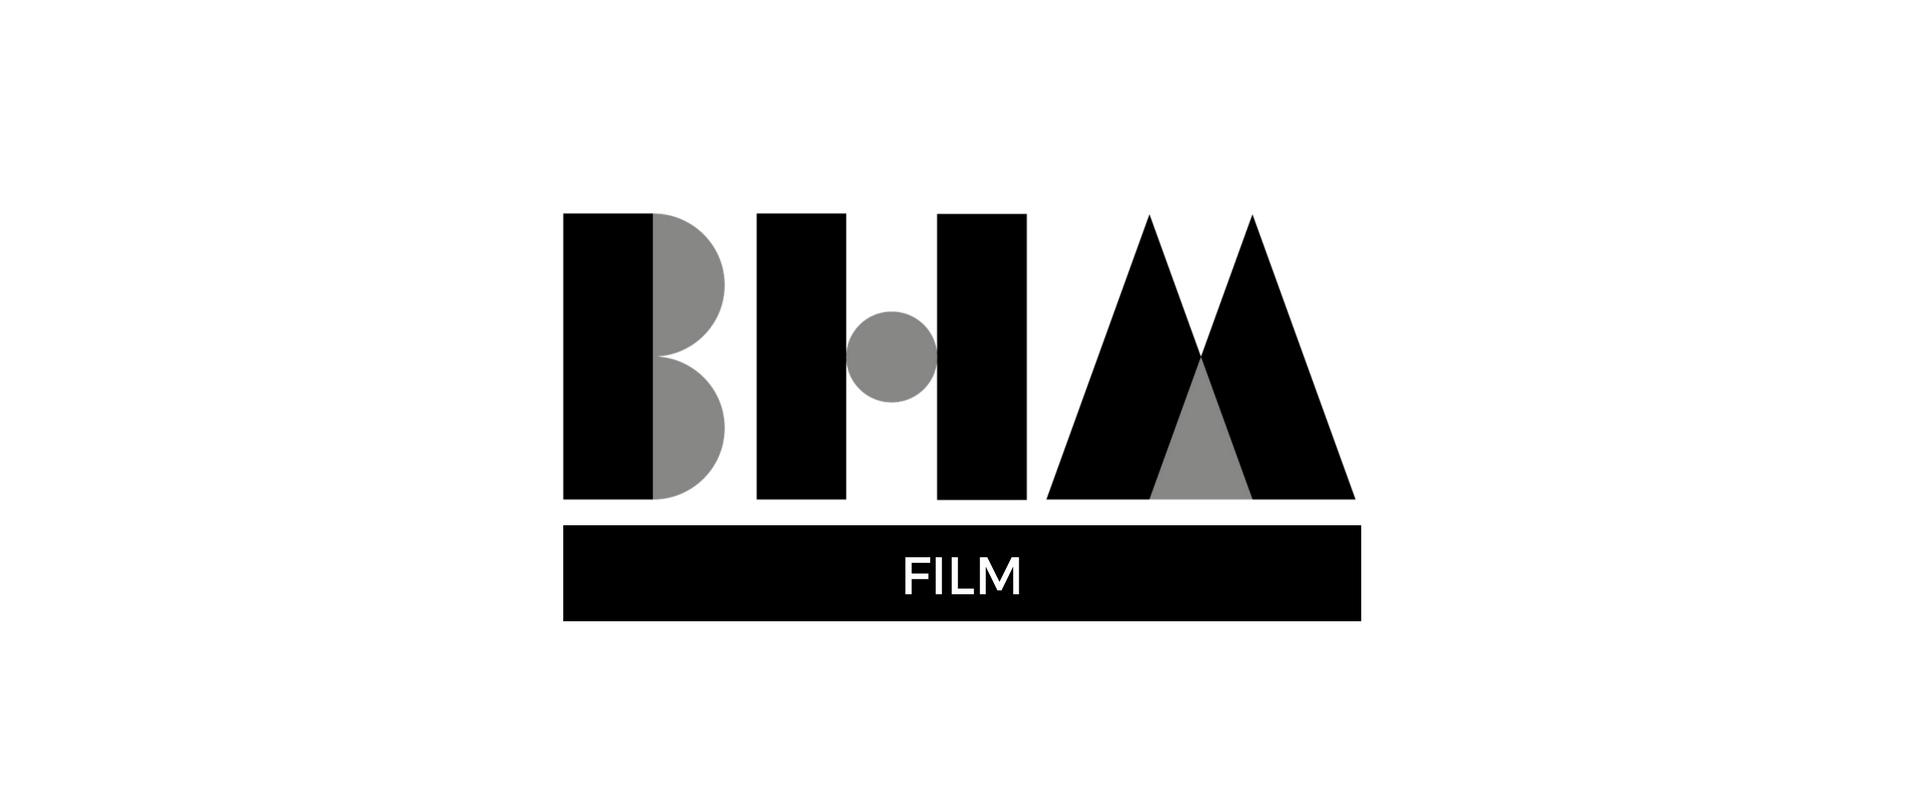 BHM Film — Page Banner